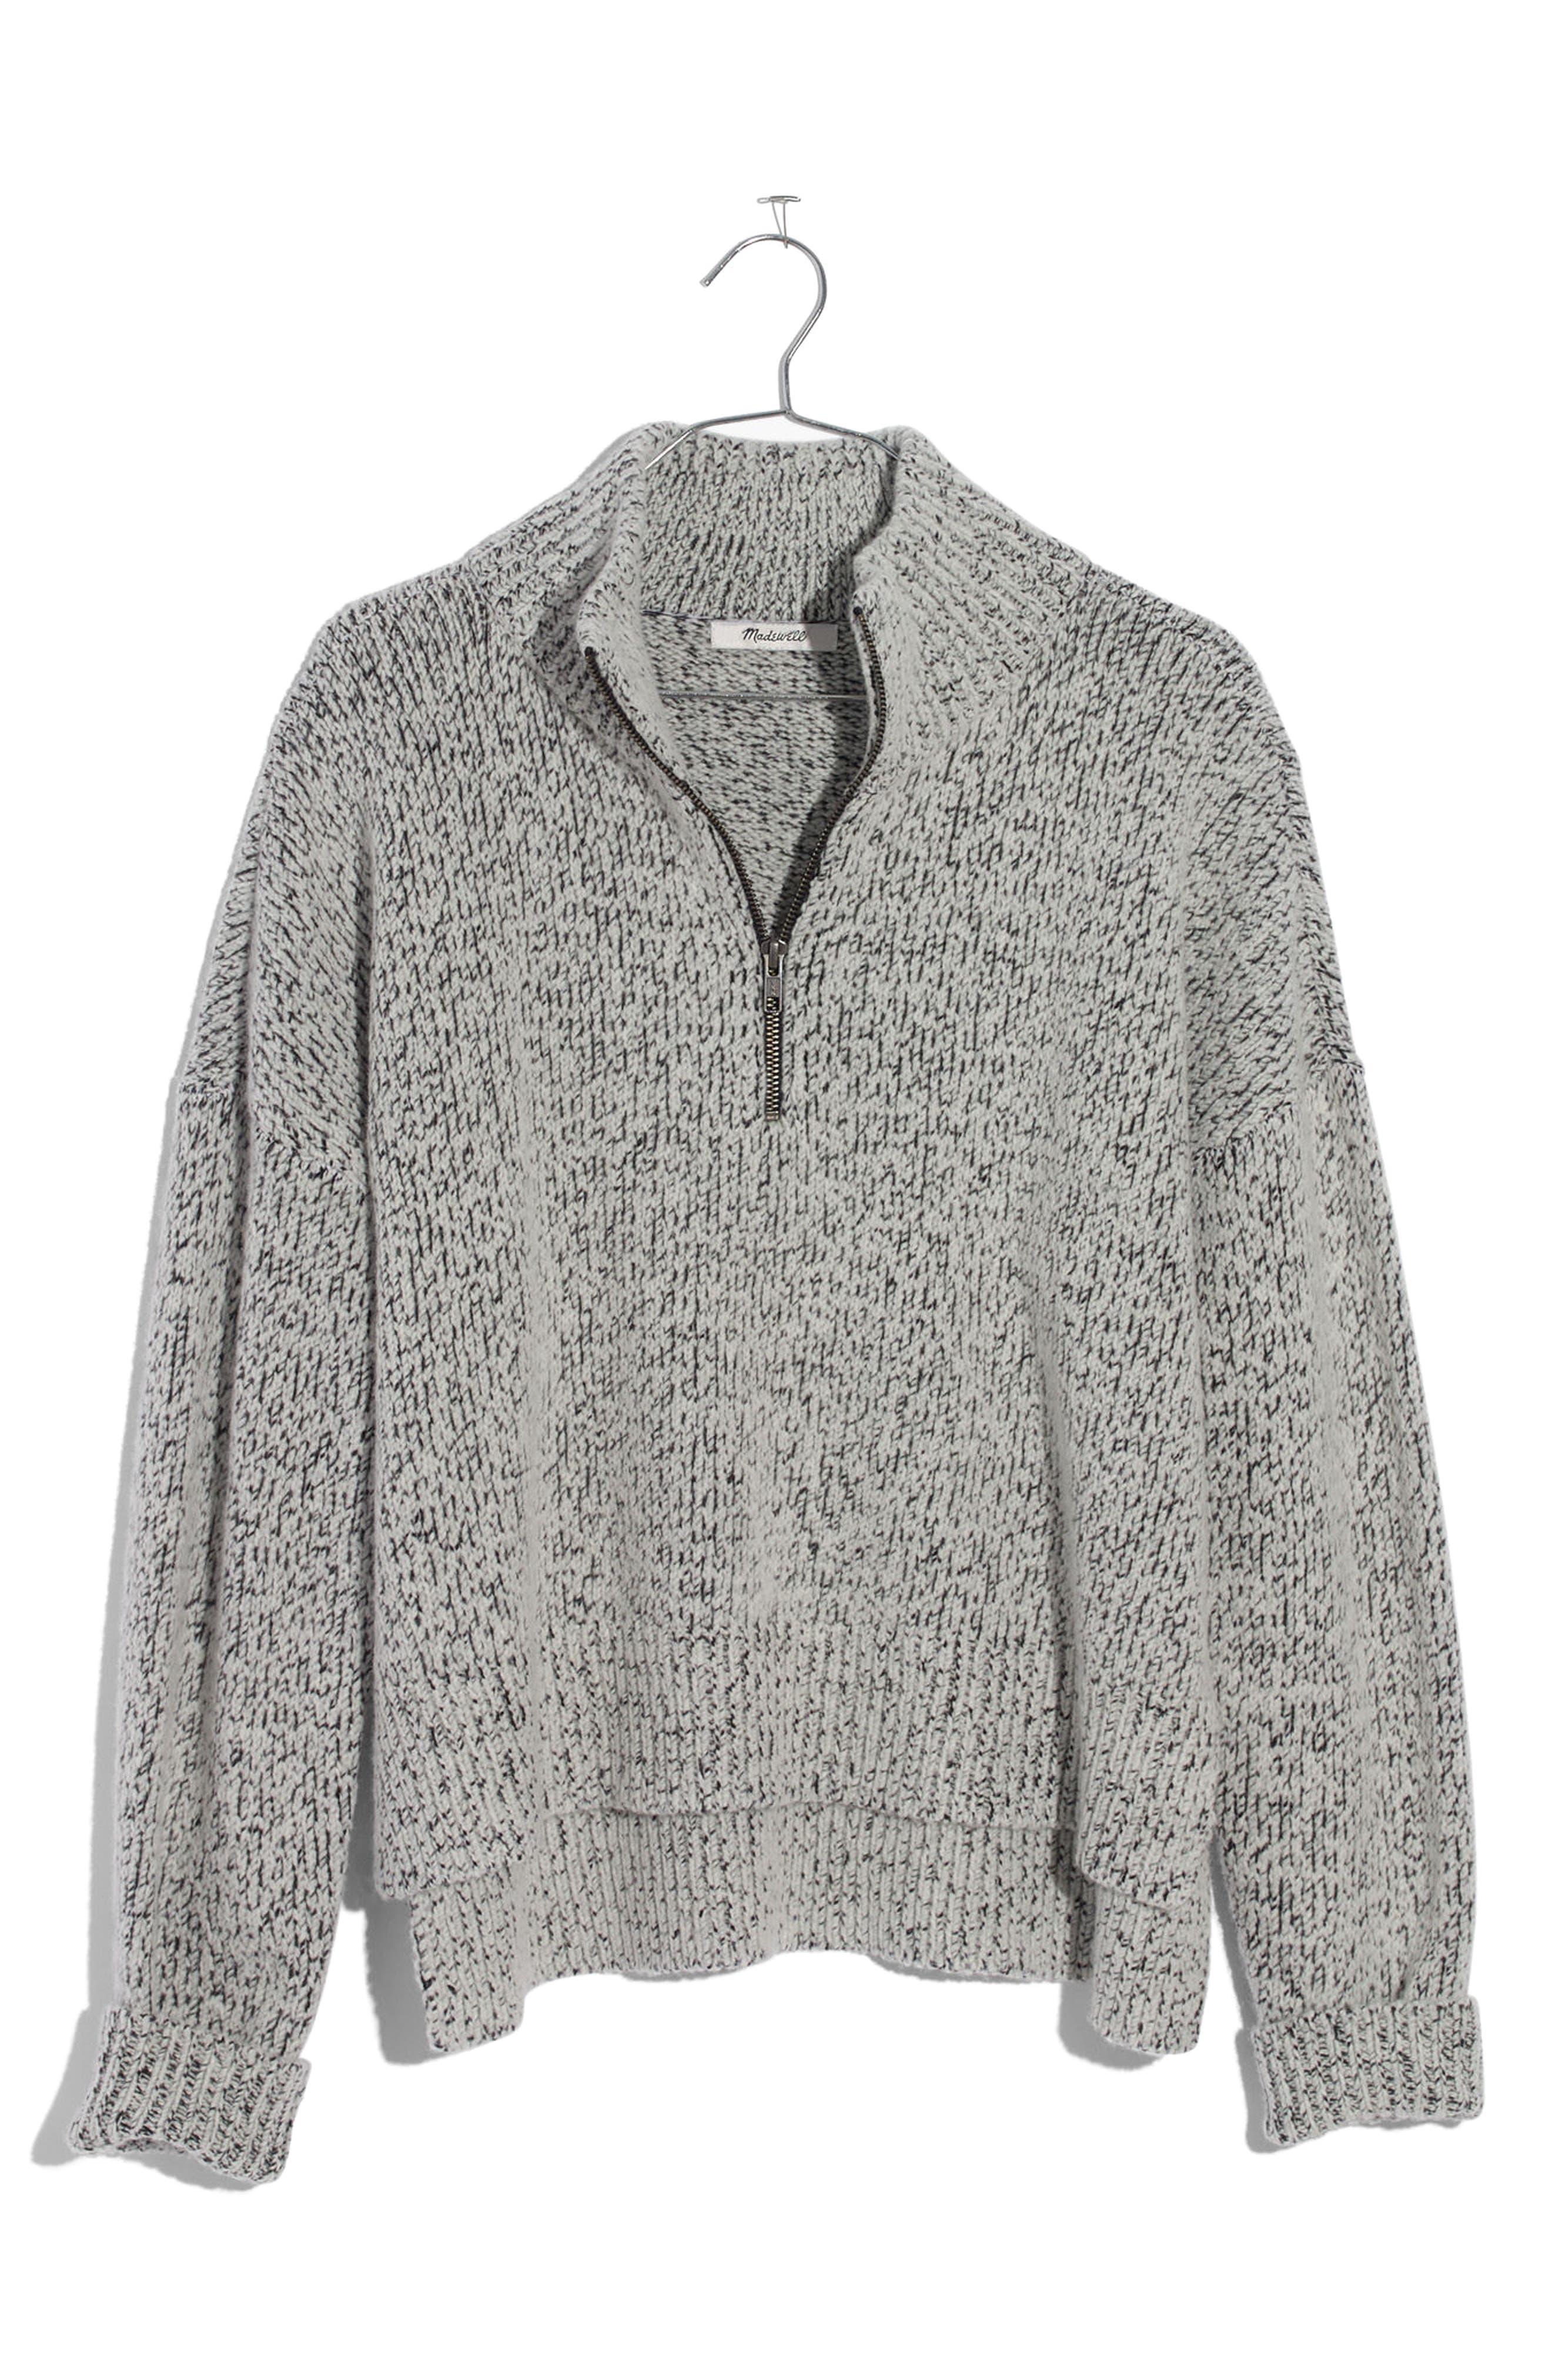 Marled Half Zip Sweater,                             Alternate thumbnail 4, color,                             020